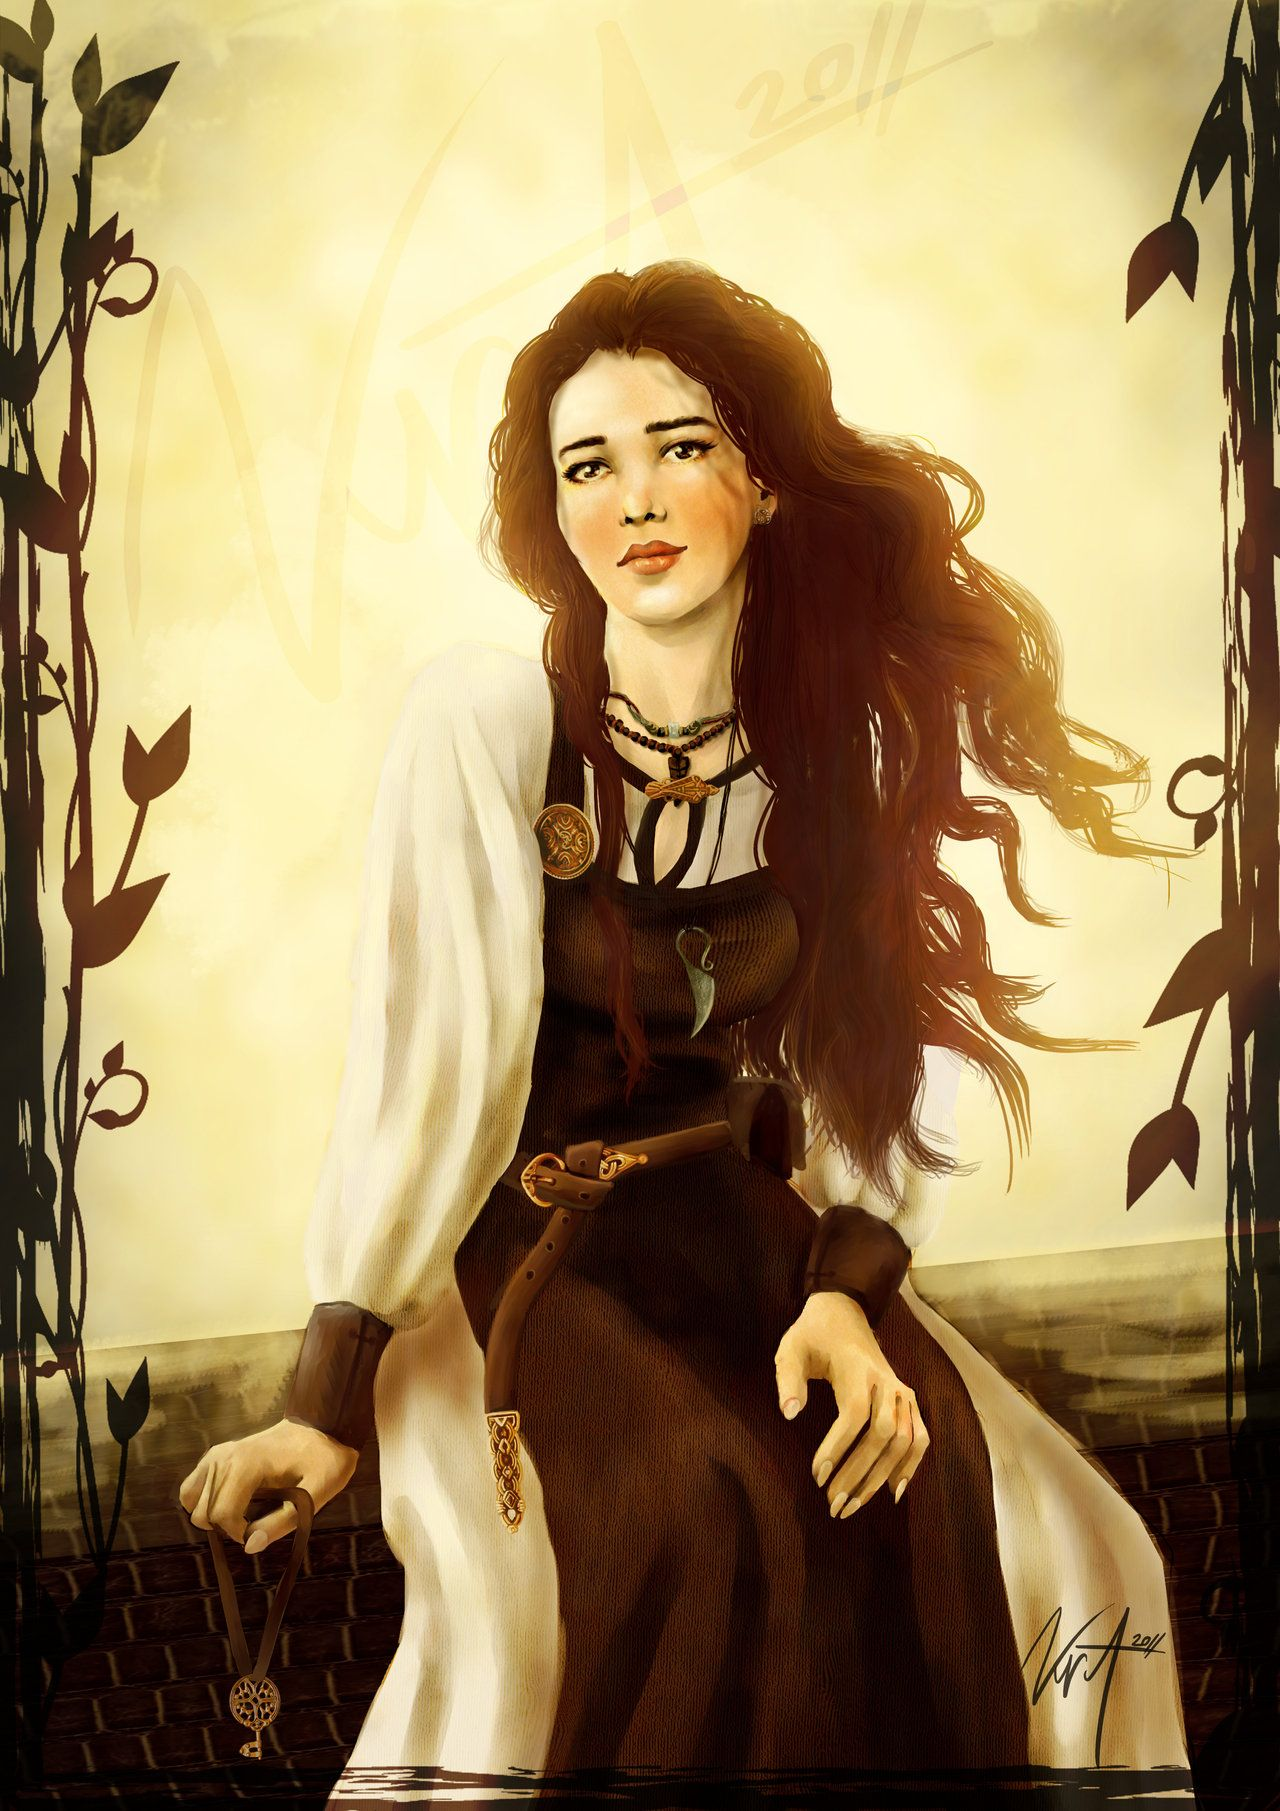 Viking Girl  http://lady-kira-night.deviantart.com/art/Viking-Girl-259319403?q=boost:popular%20digital%20girl&qo=162